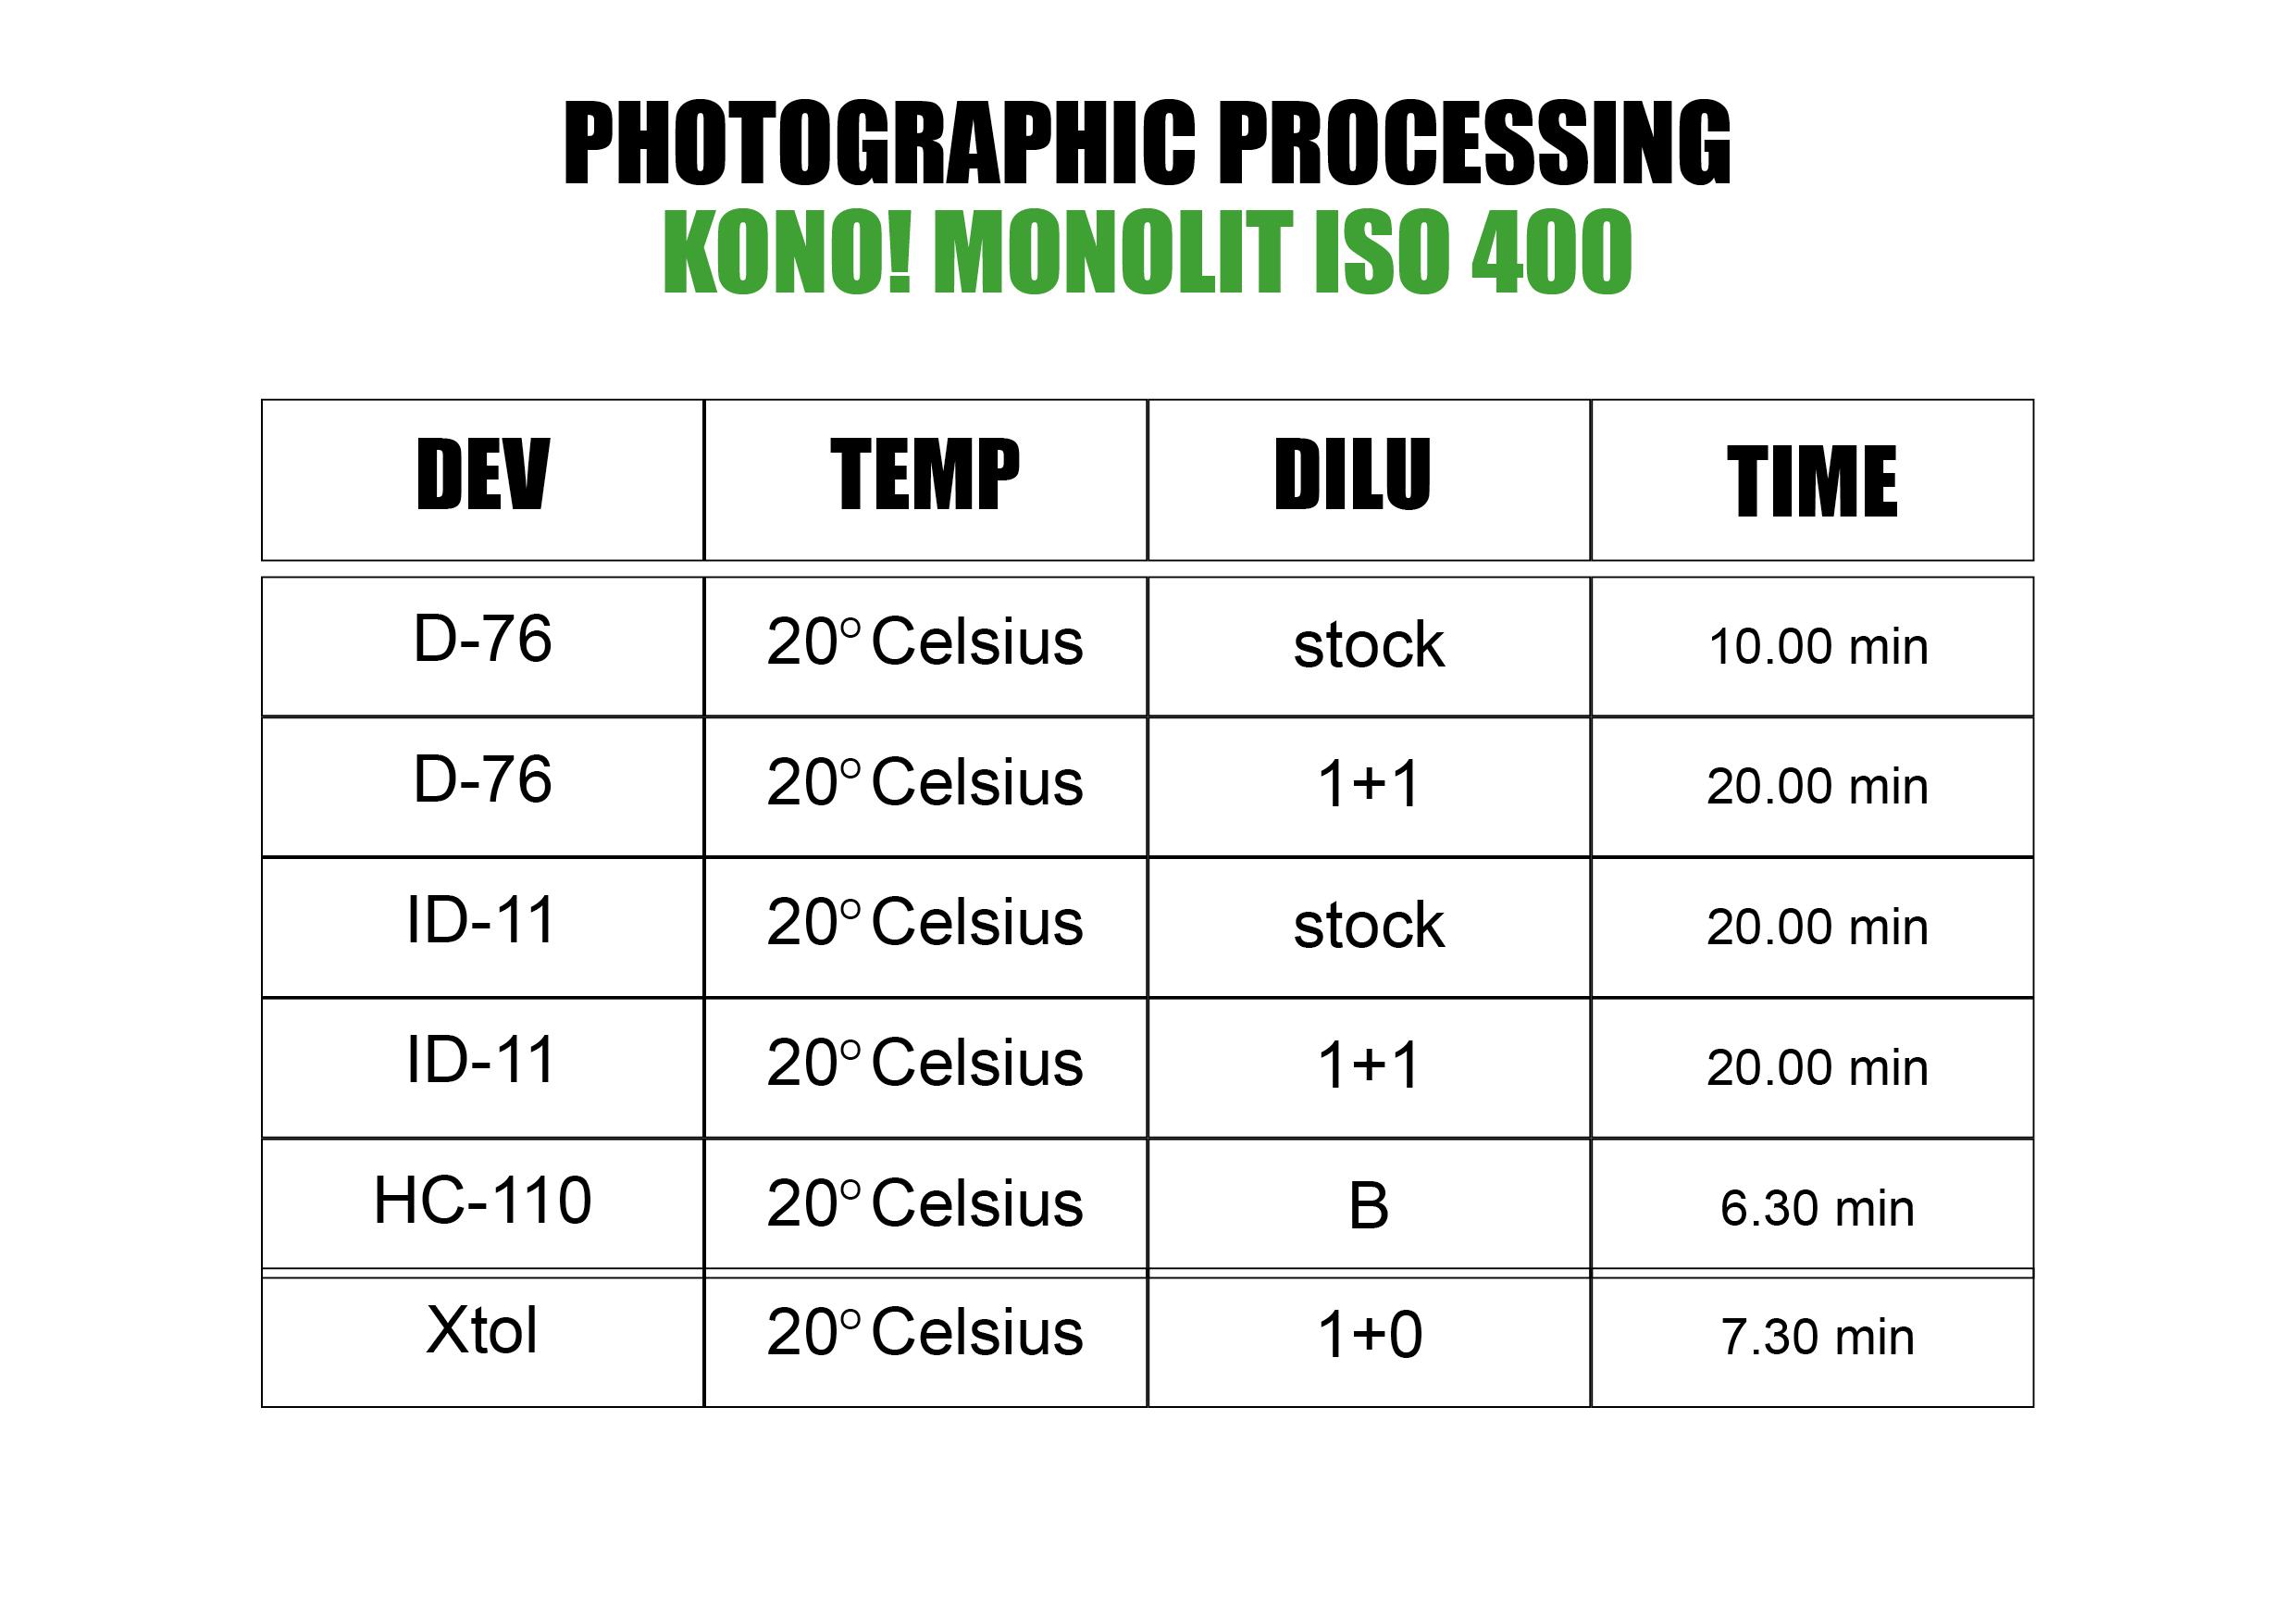 DEV_Monolit_400.jpg